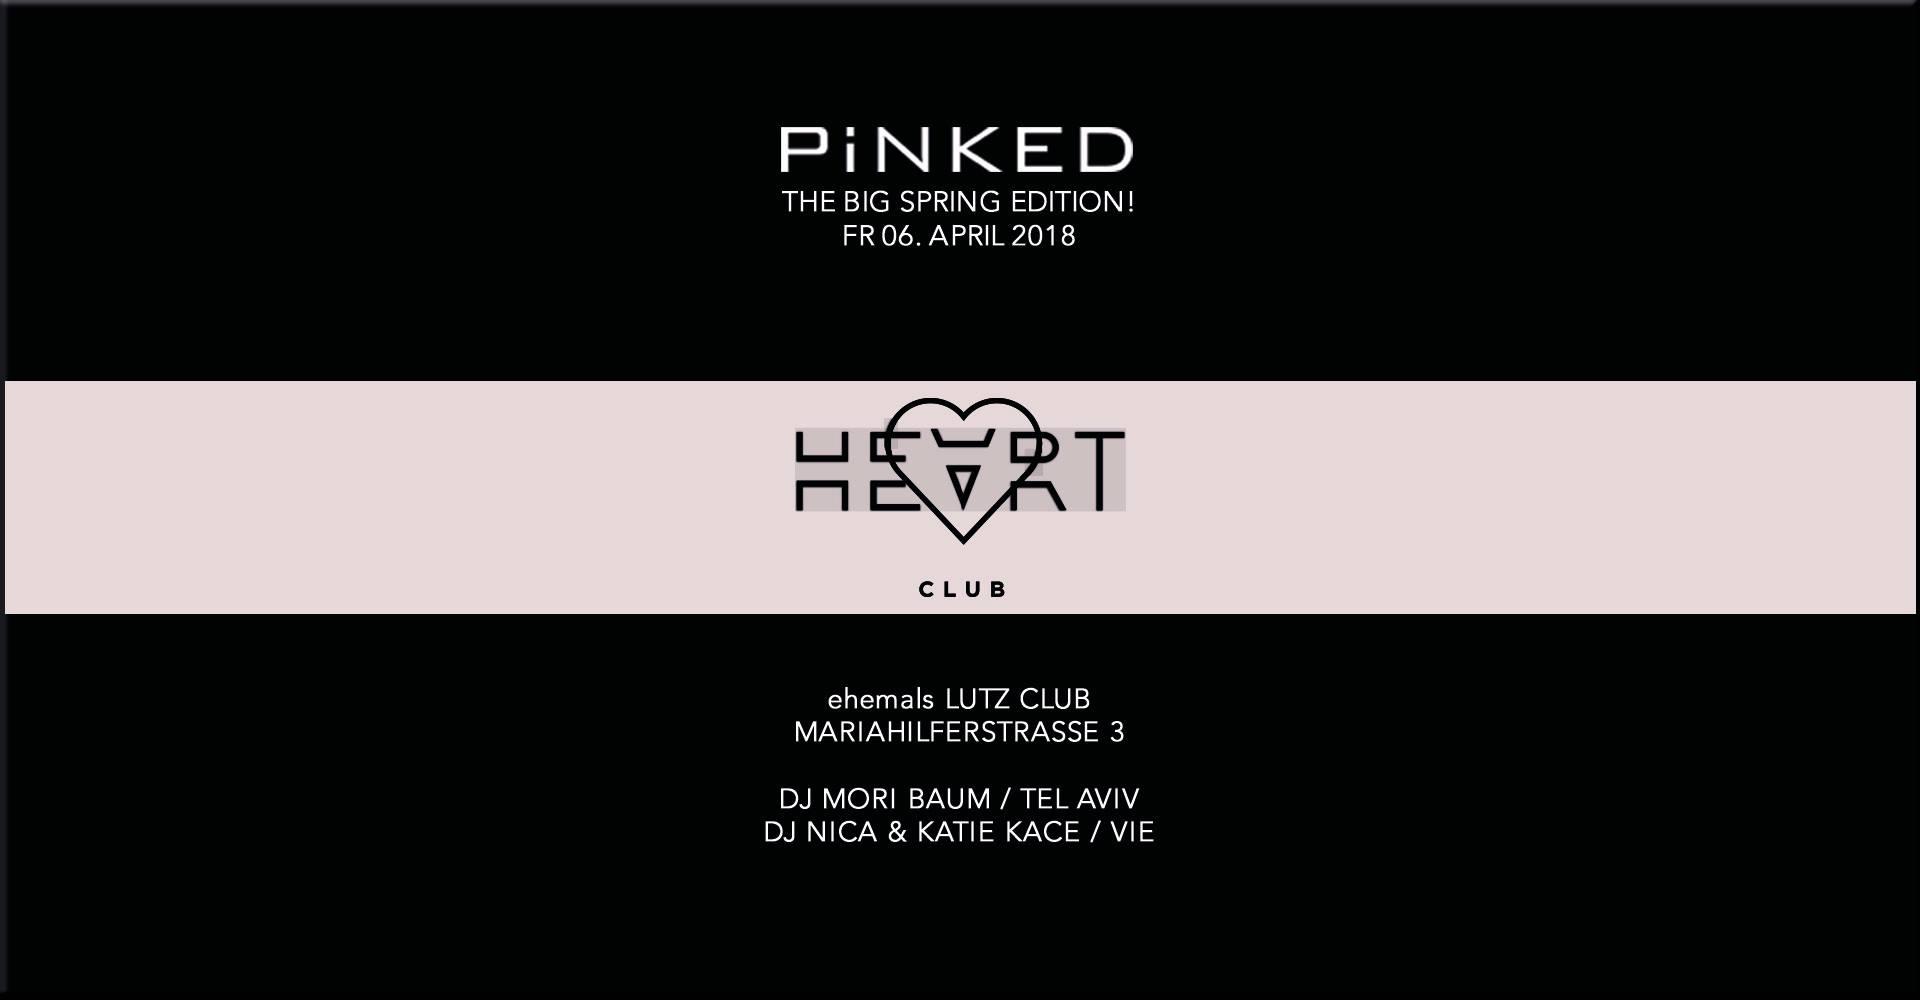 Pinked @ Heart Club Vienna